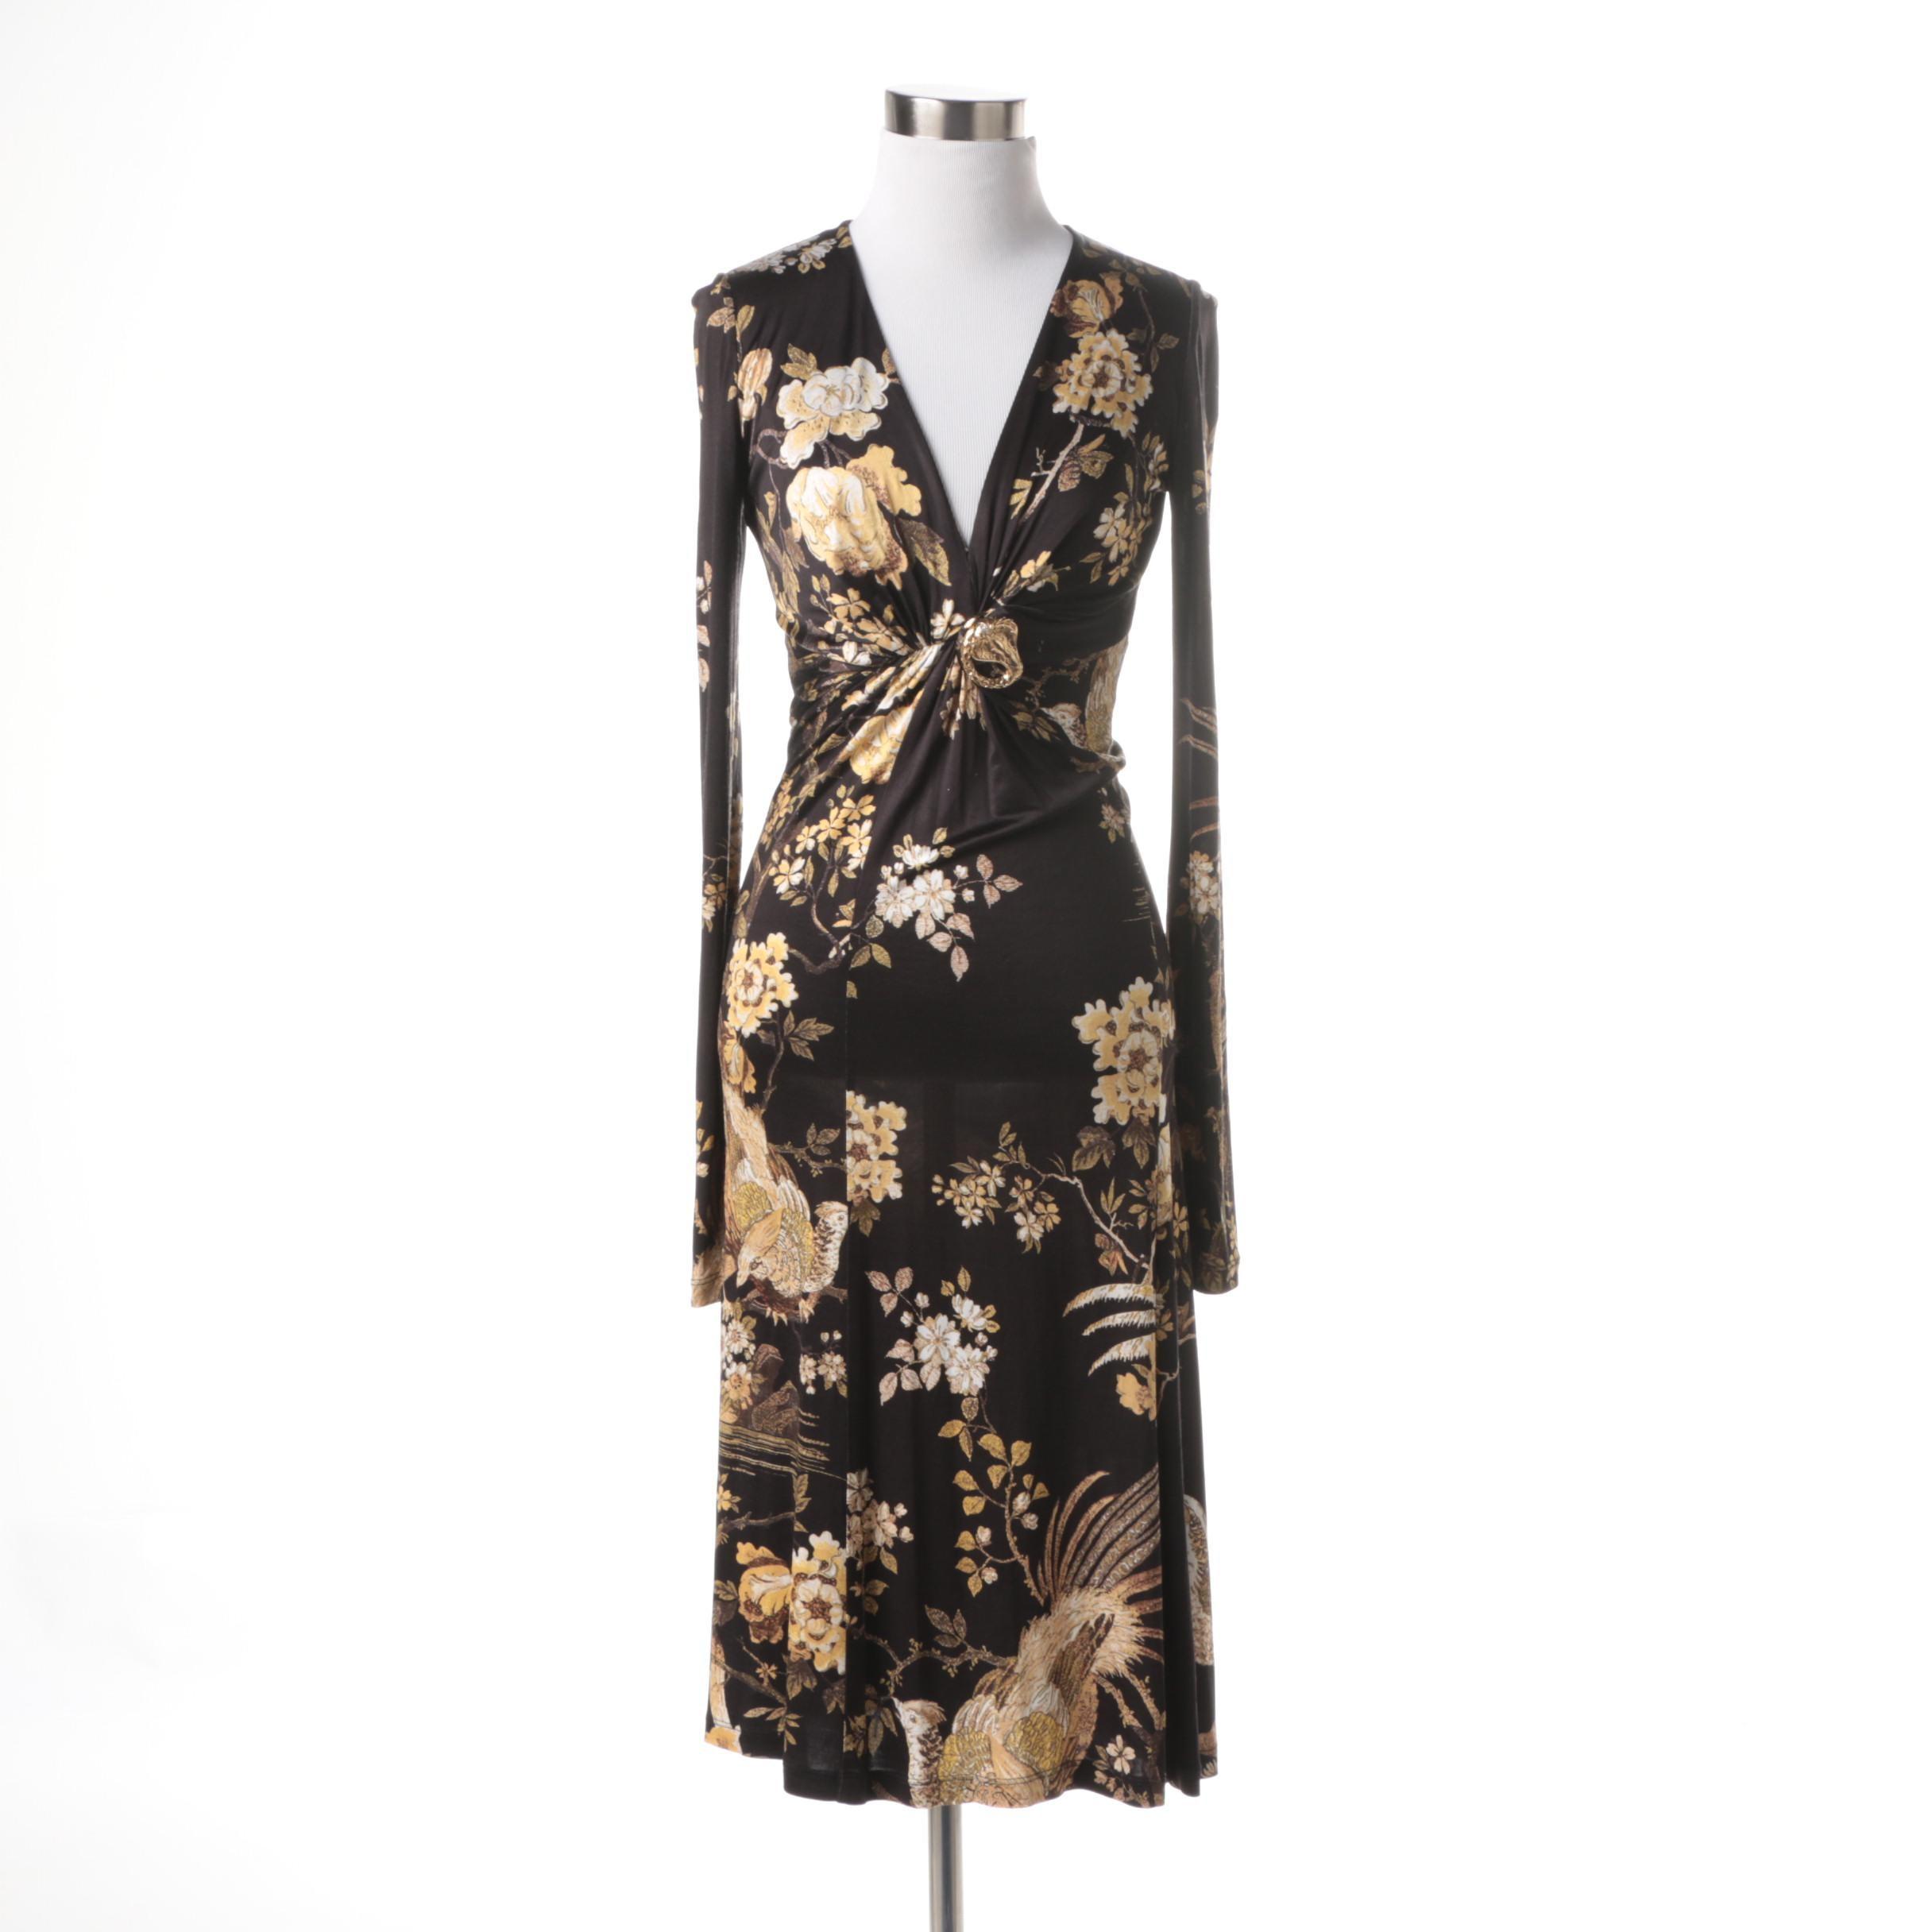 Roberto Cavalli Stretch Floral Print Dress